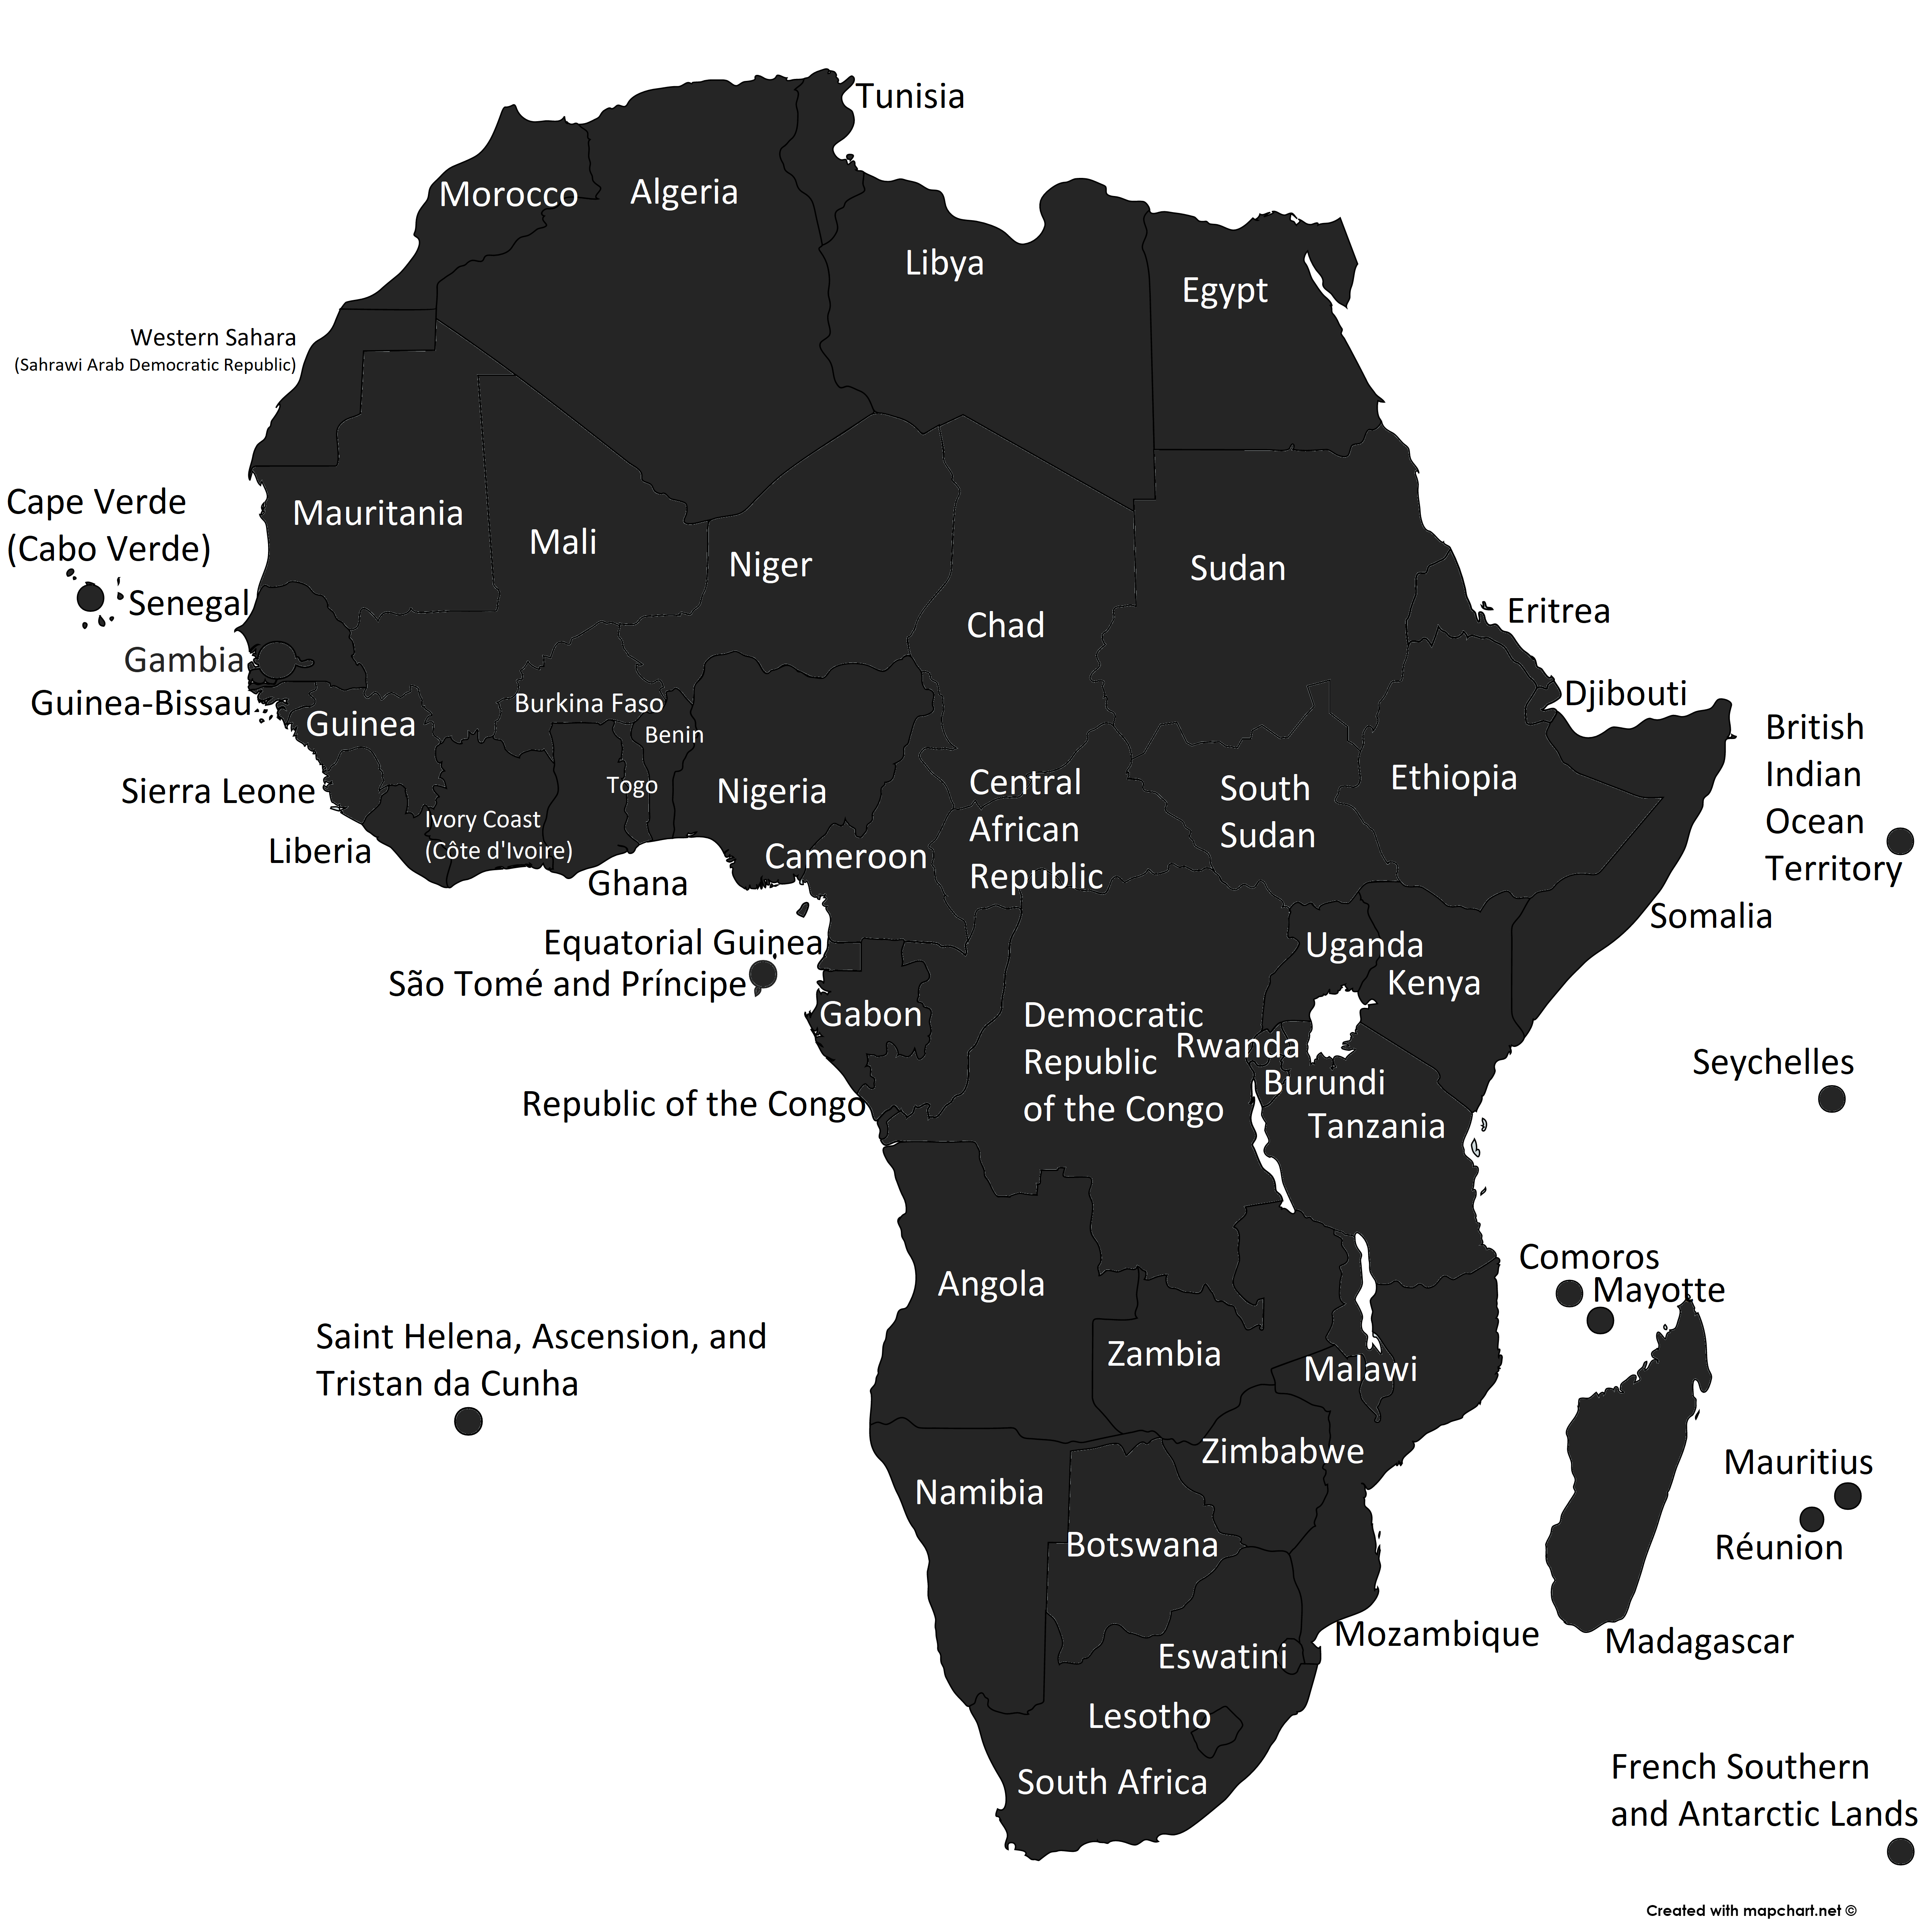 Africa Global Map